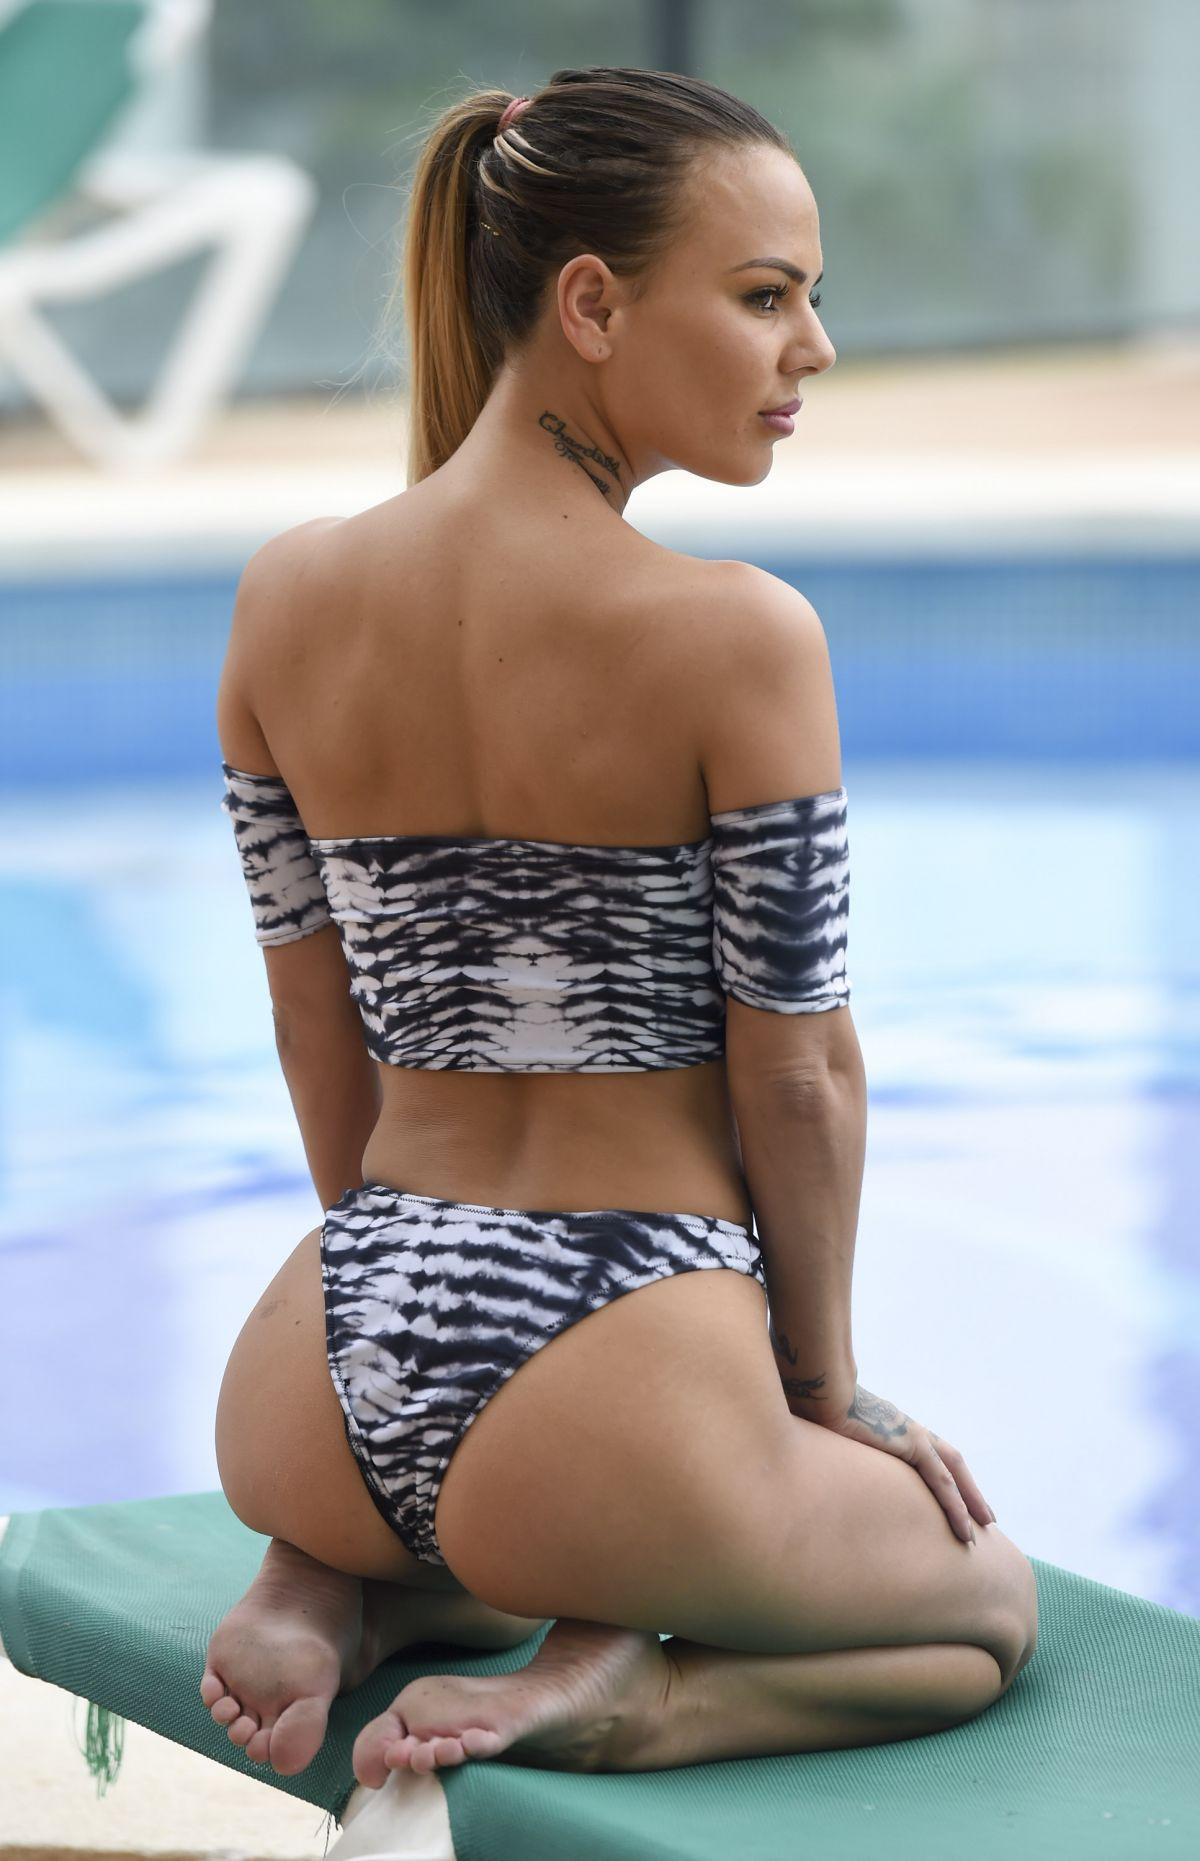 Tiny Bikini Hintern Bilder